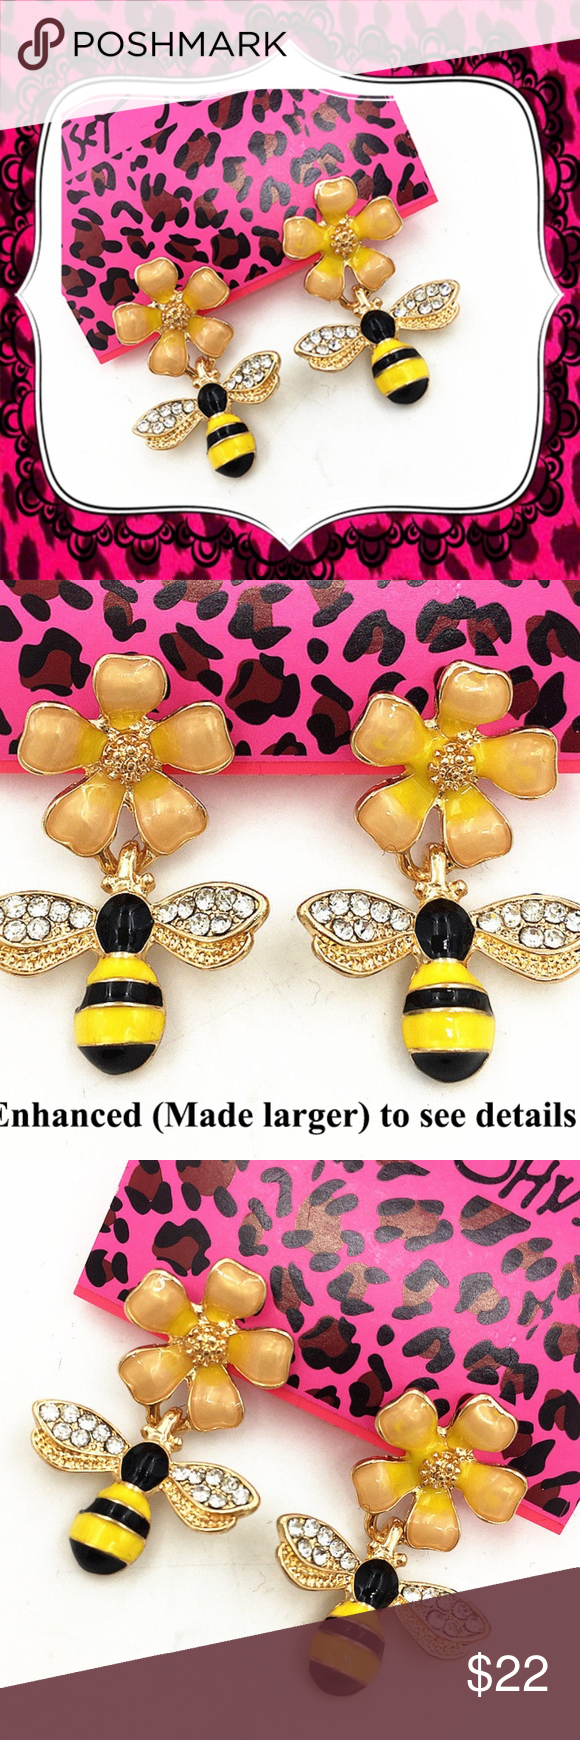 126f5b2ffaad8 Betsey Johnson Crystal, Flower & HoneyBee Earrings Crystal Enamel ...